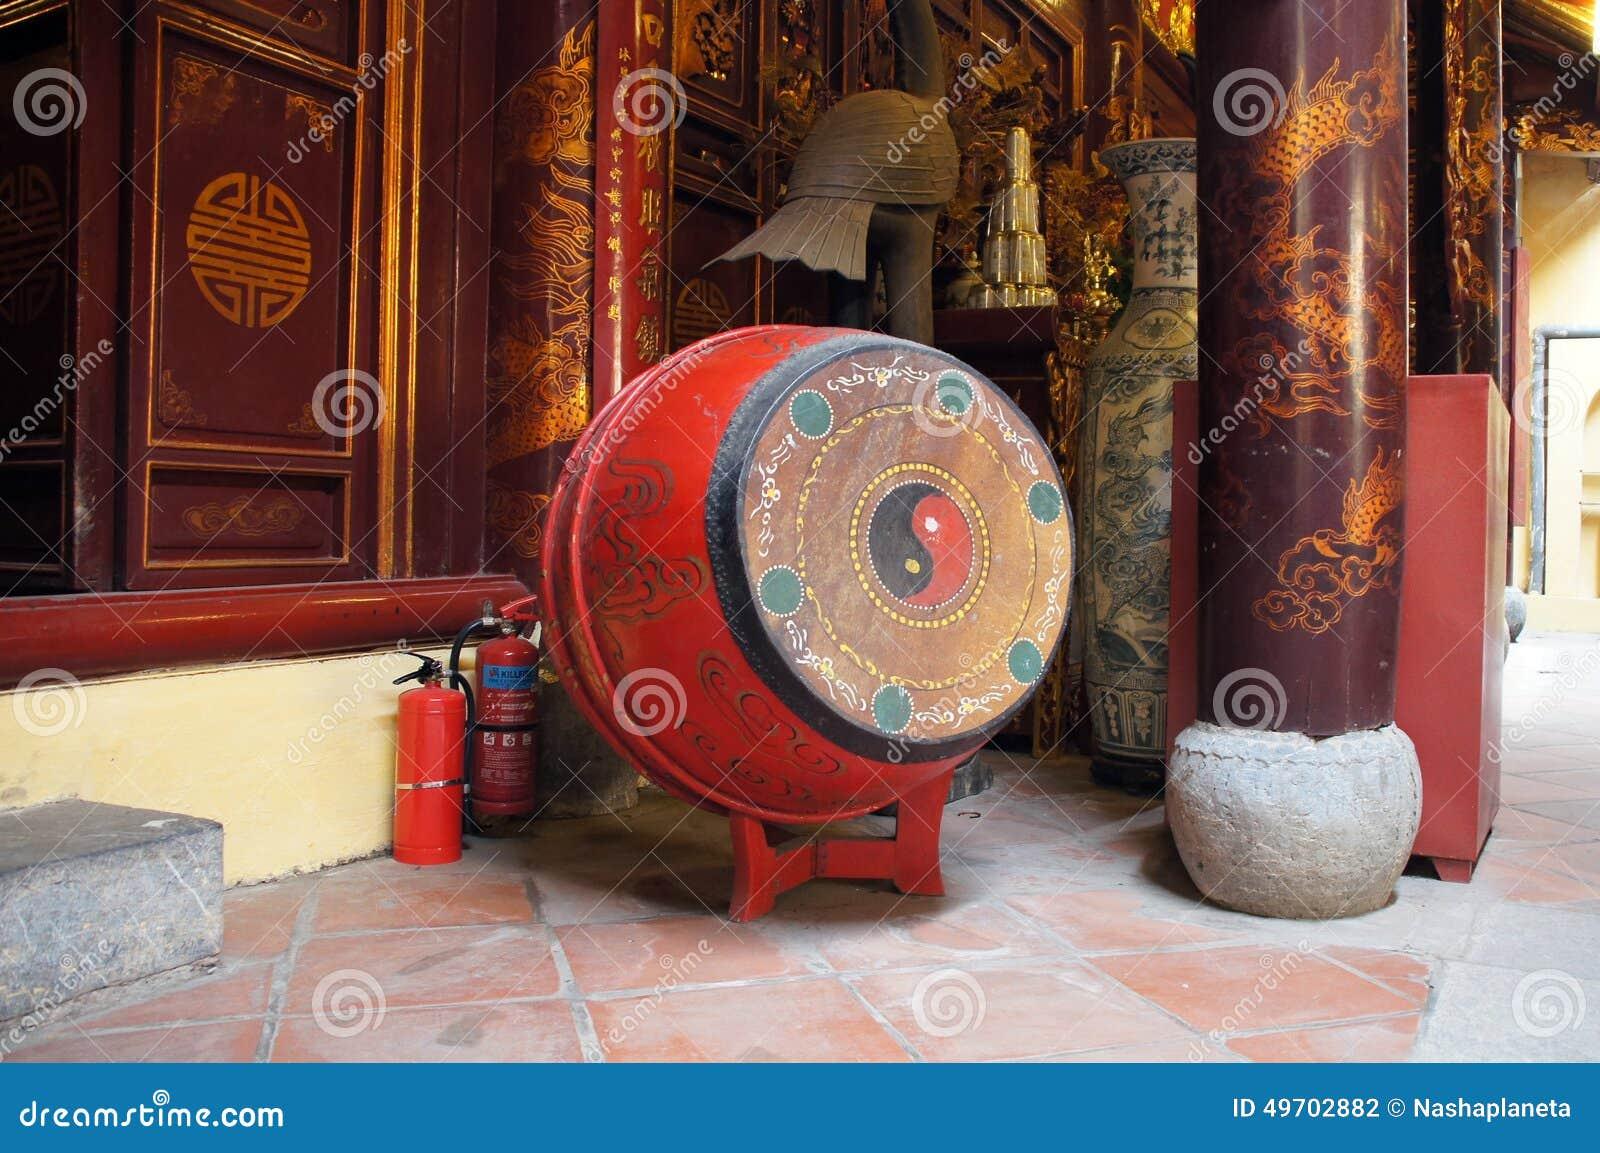 Drum in Bach Ma temple, Hanoi, Vietnam